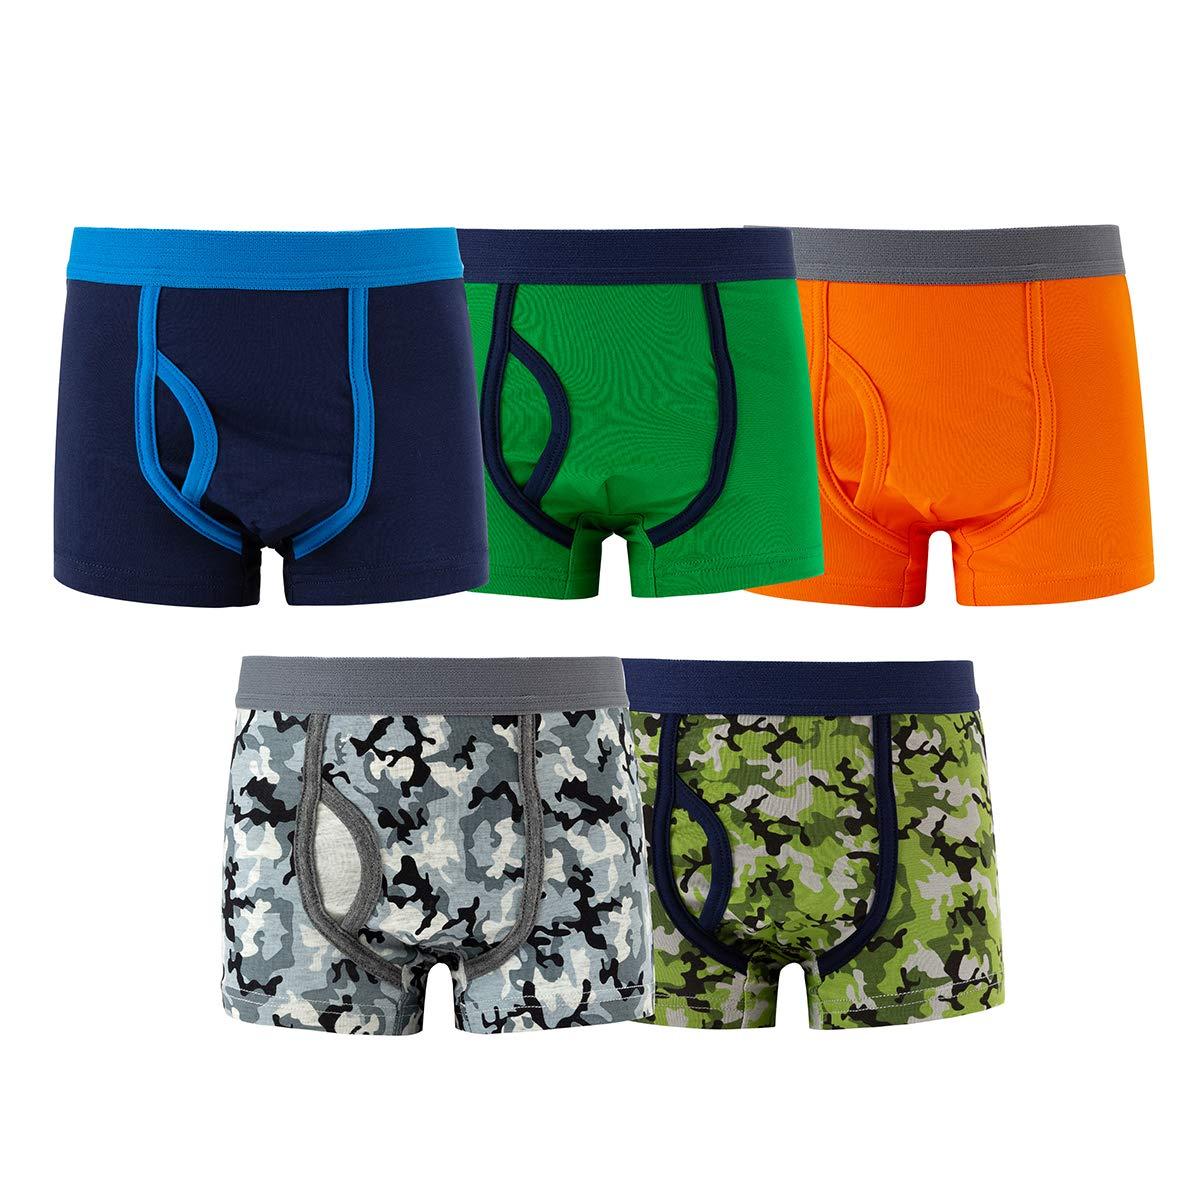 MAMABIBI Boys Boxer Briefs Big Camo Cotton Underwear 5 of Pack